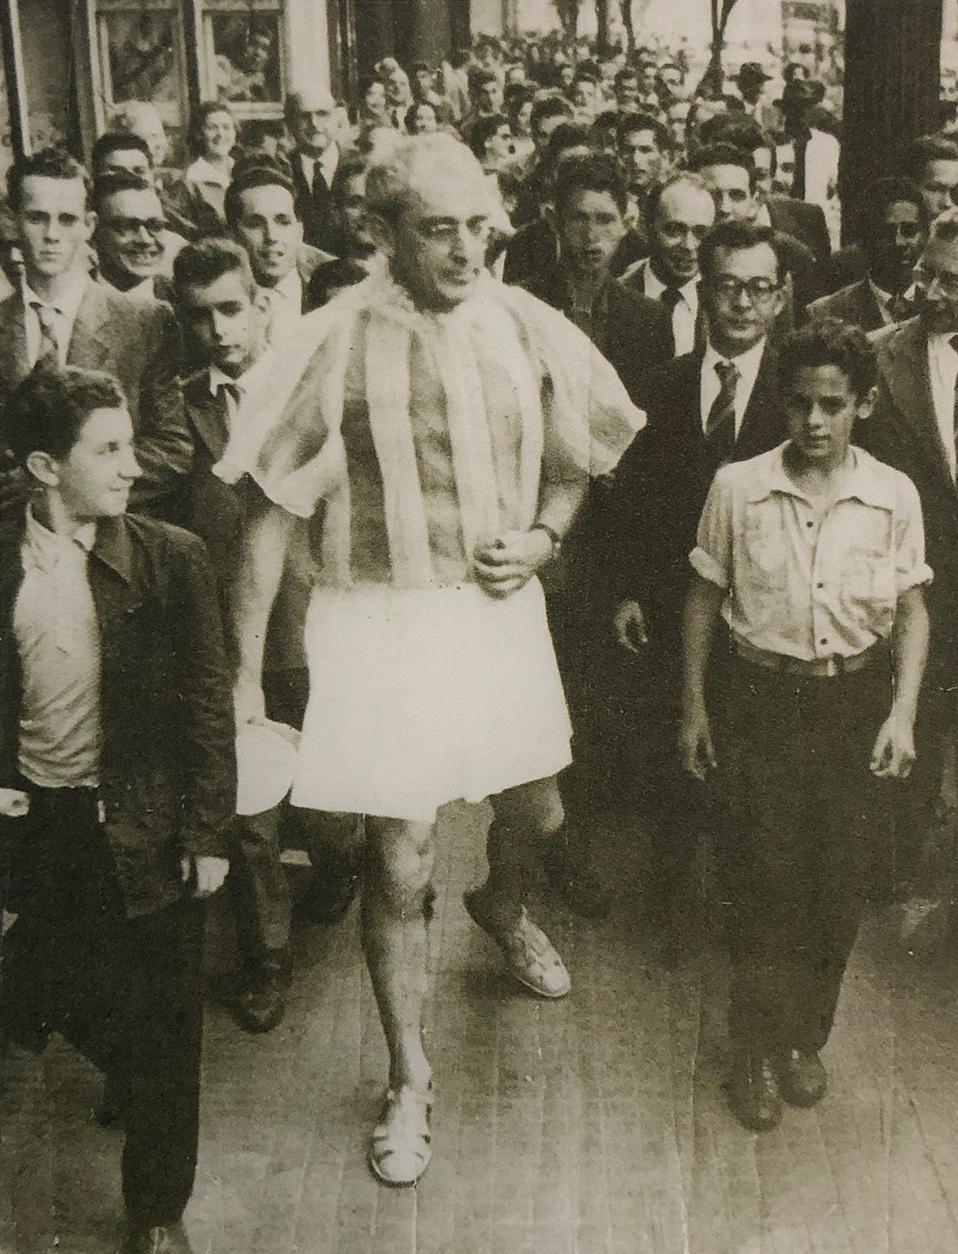 4.Flávio de Carvalho, in his 1956 New Look performing in the streets of São Paulo CEDAE Archives, Universidade de Campinas -UNICAMP - SP